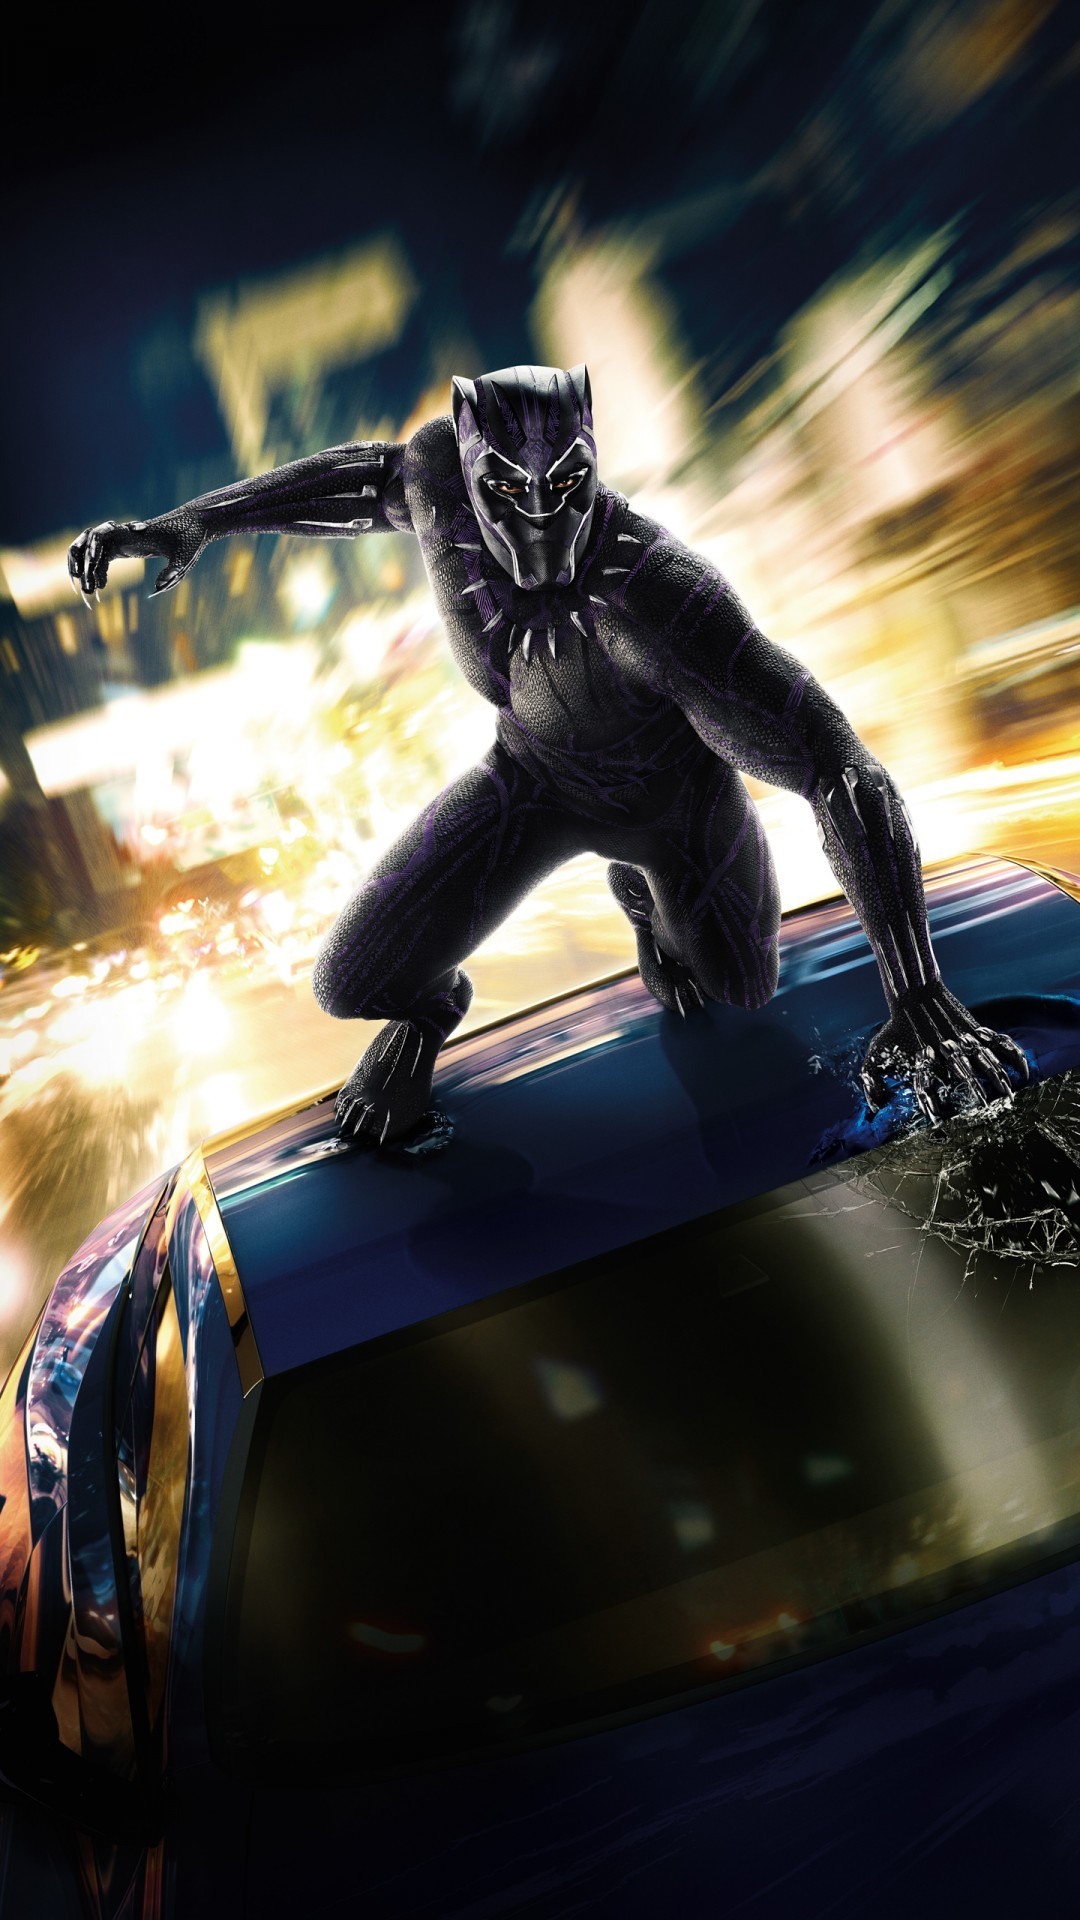 Free Black Panther Movie phone wallpaper by momo007